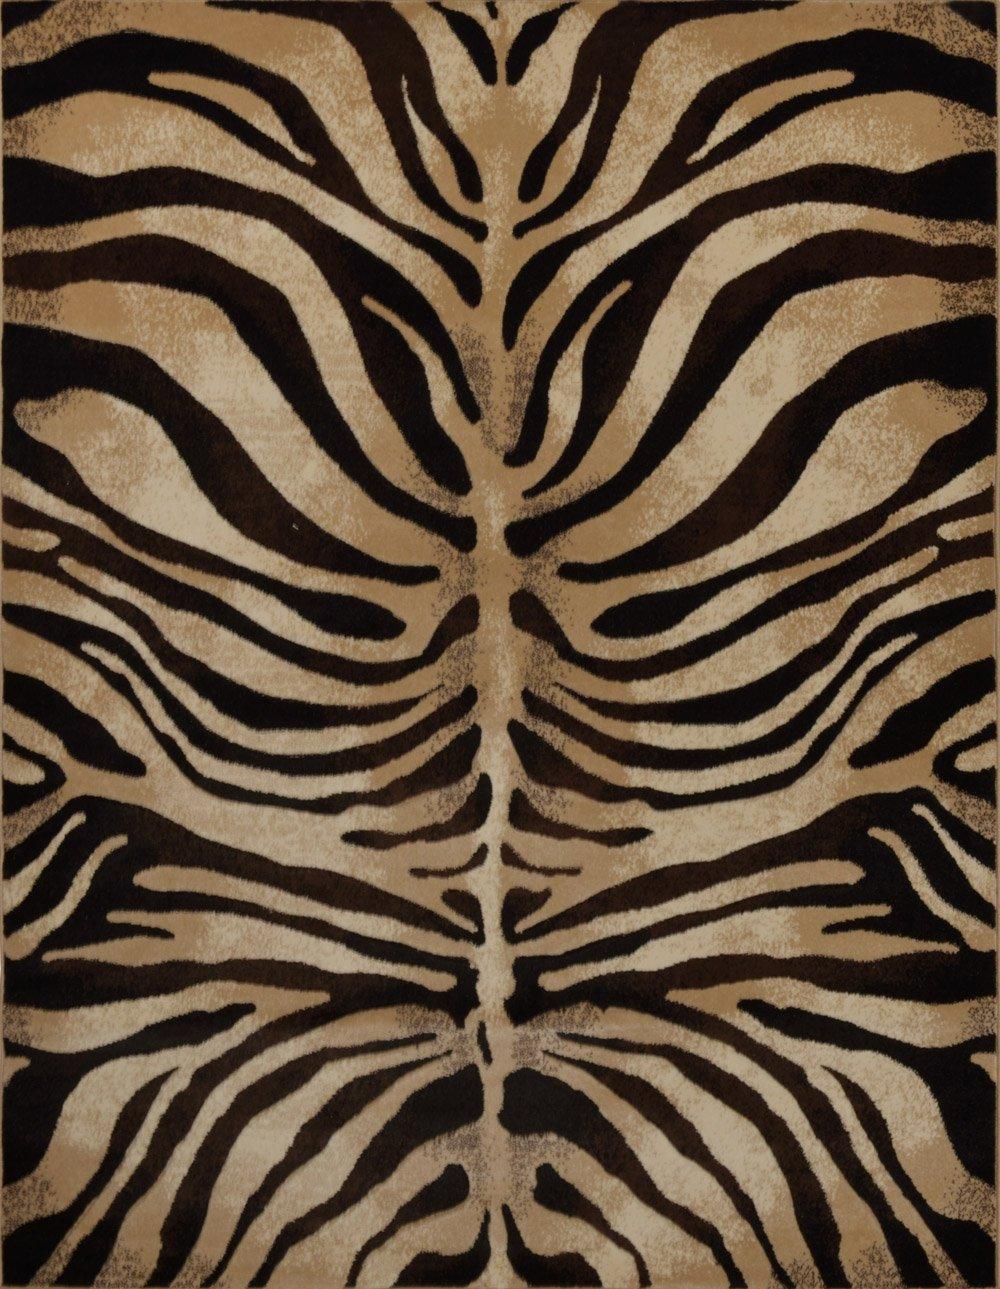 Modern Zebra Stripes Area Rug 8x11 Animal Skin Print Carpet-Actual 7'10''x10'6''